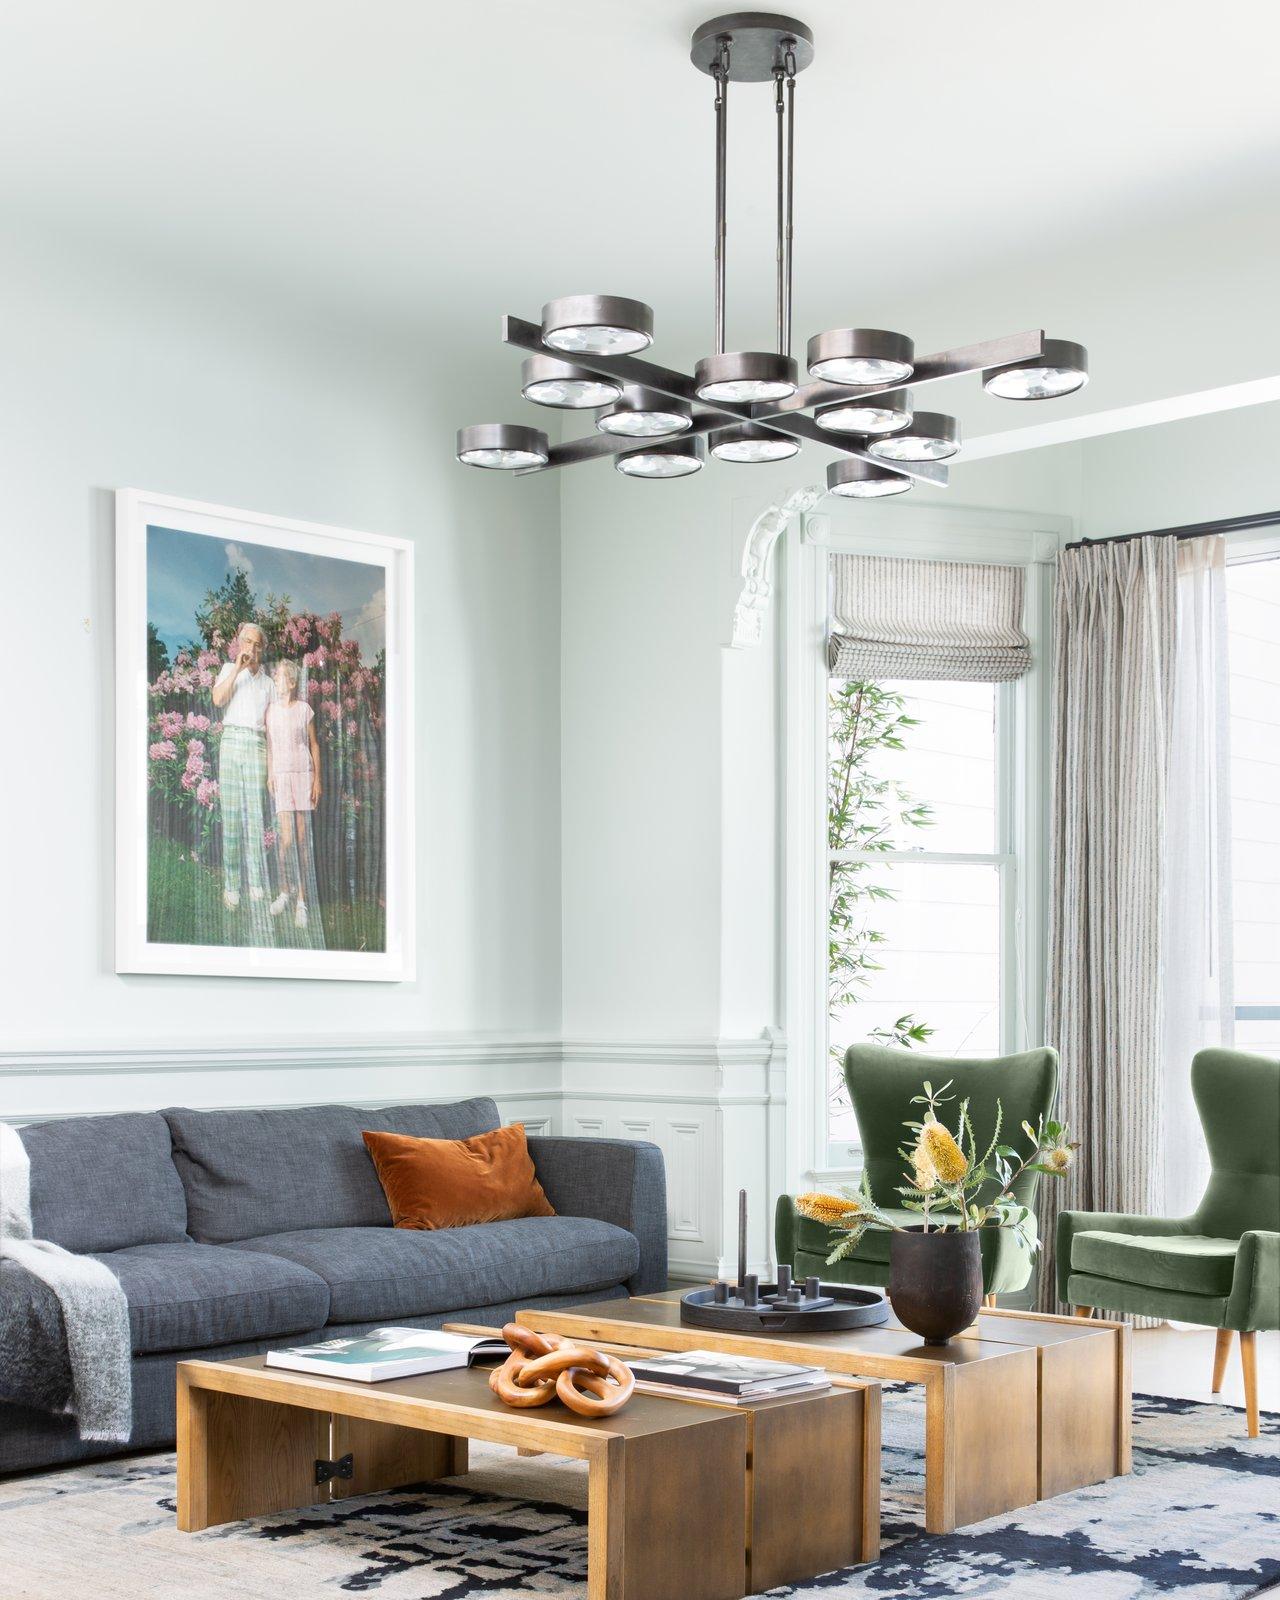 Living Room, Rug Floor, Pendant Lighting, Sofa, Light Hardwood Floor, Chair, Ceiling Lighting, and Coffee Tables Living Room  Moody Mission Victorian by Regan Baker Design